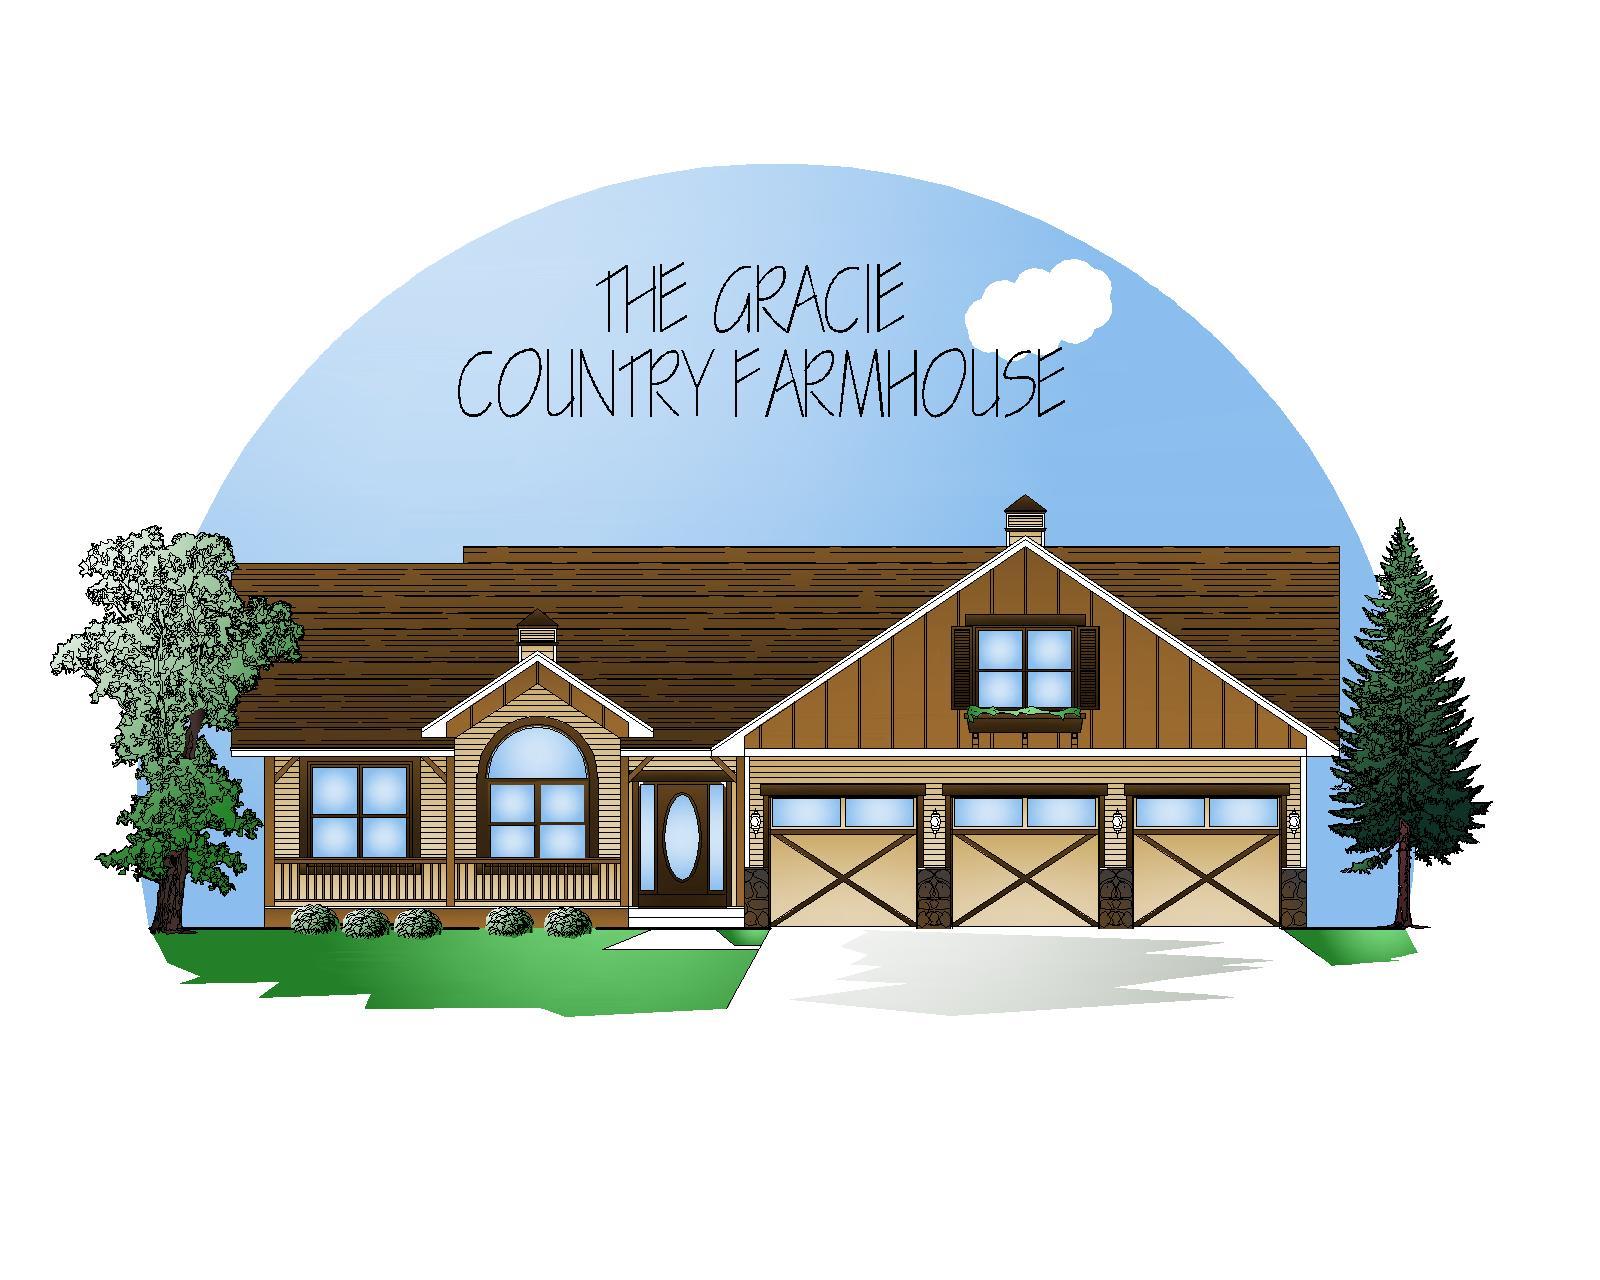 Farmhouse Gracie